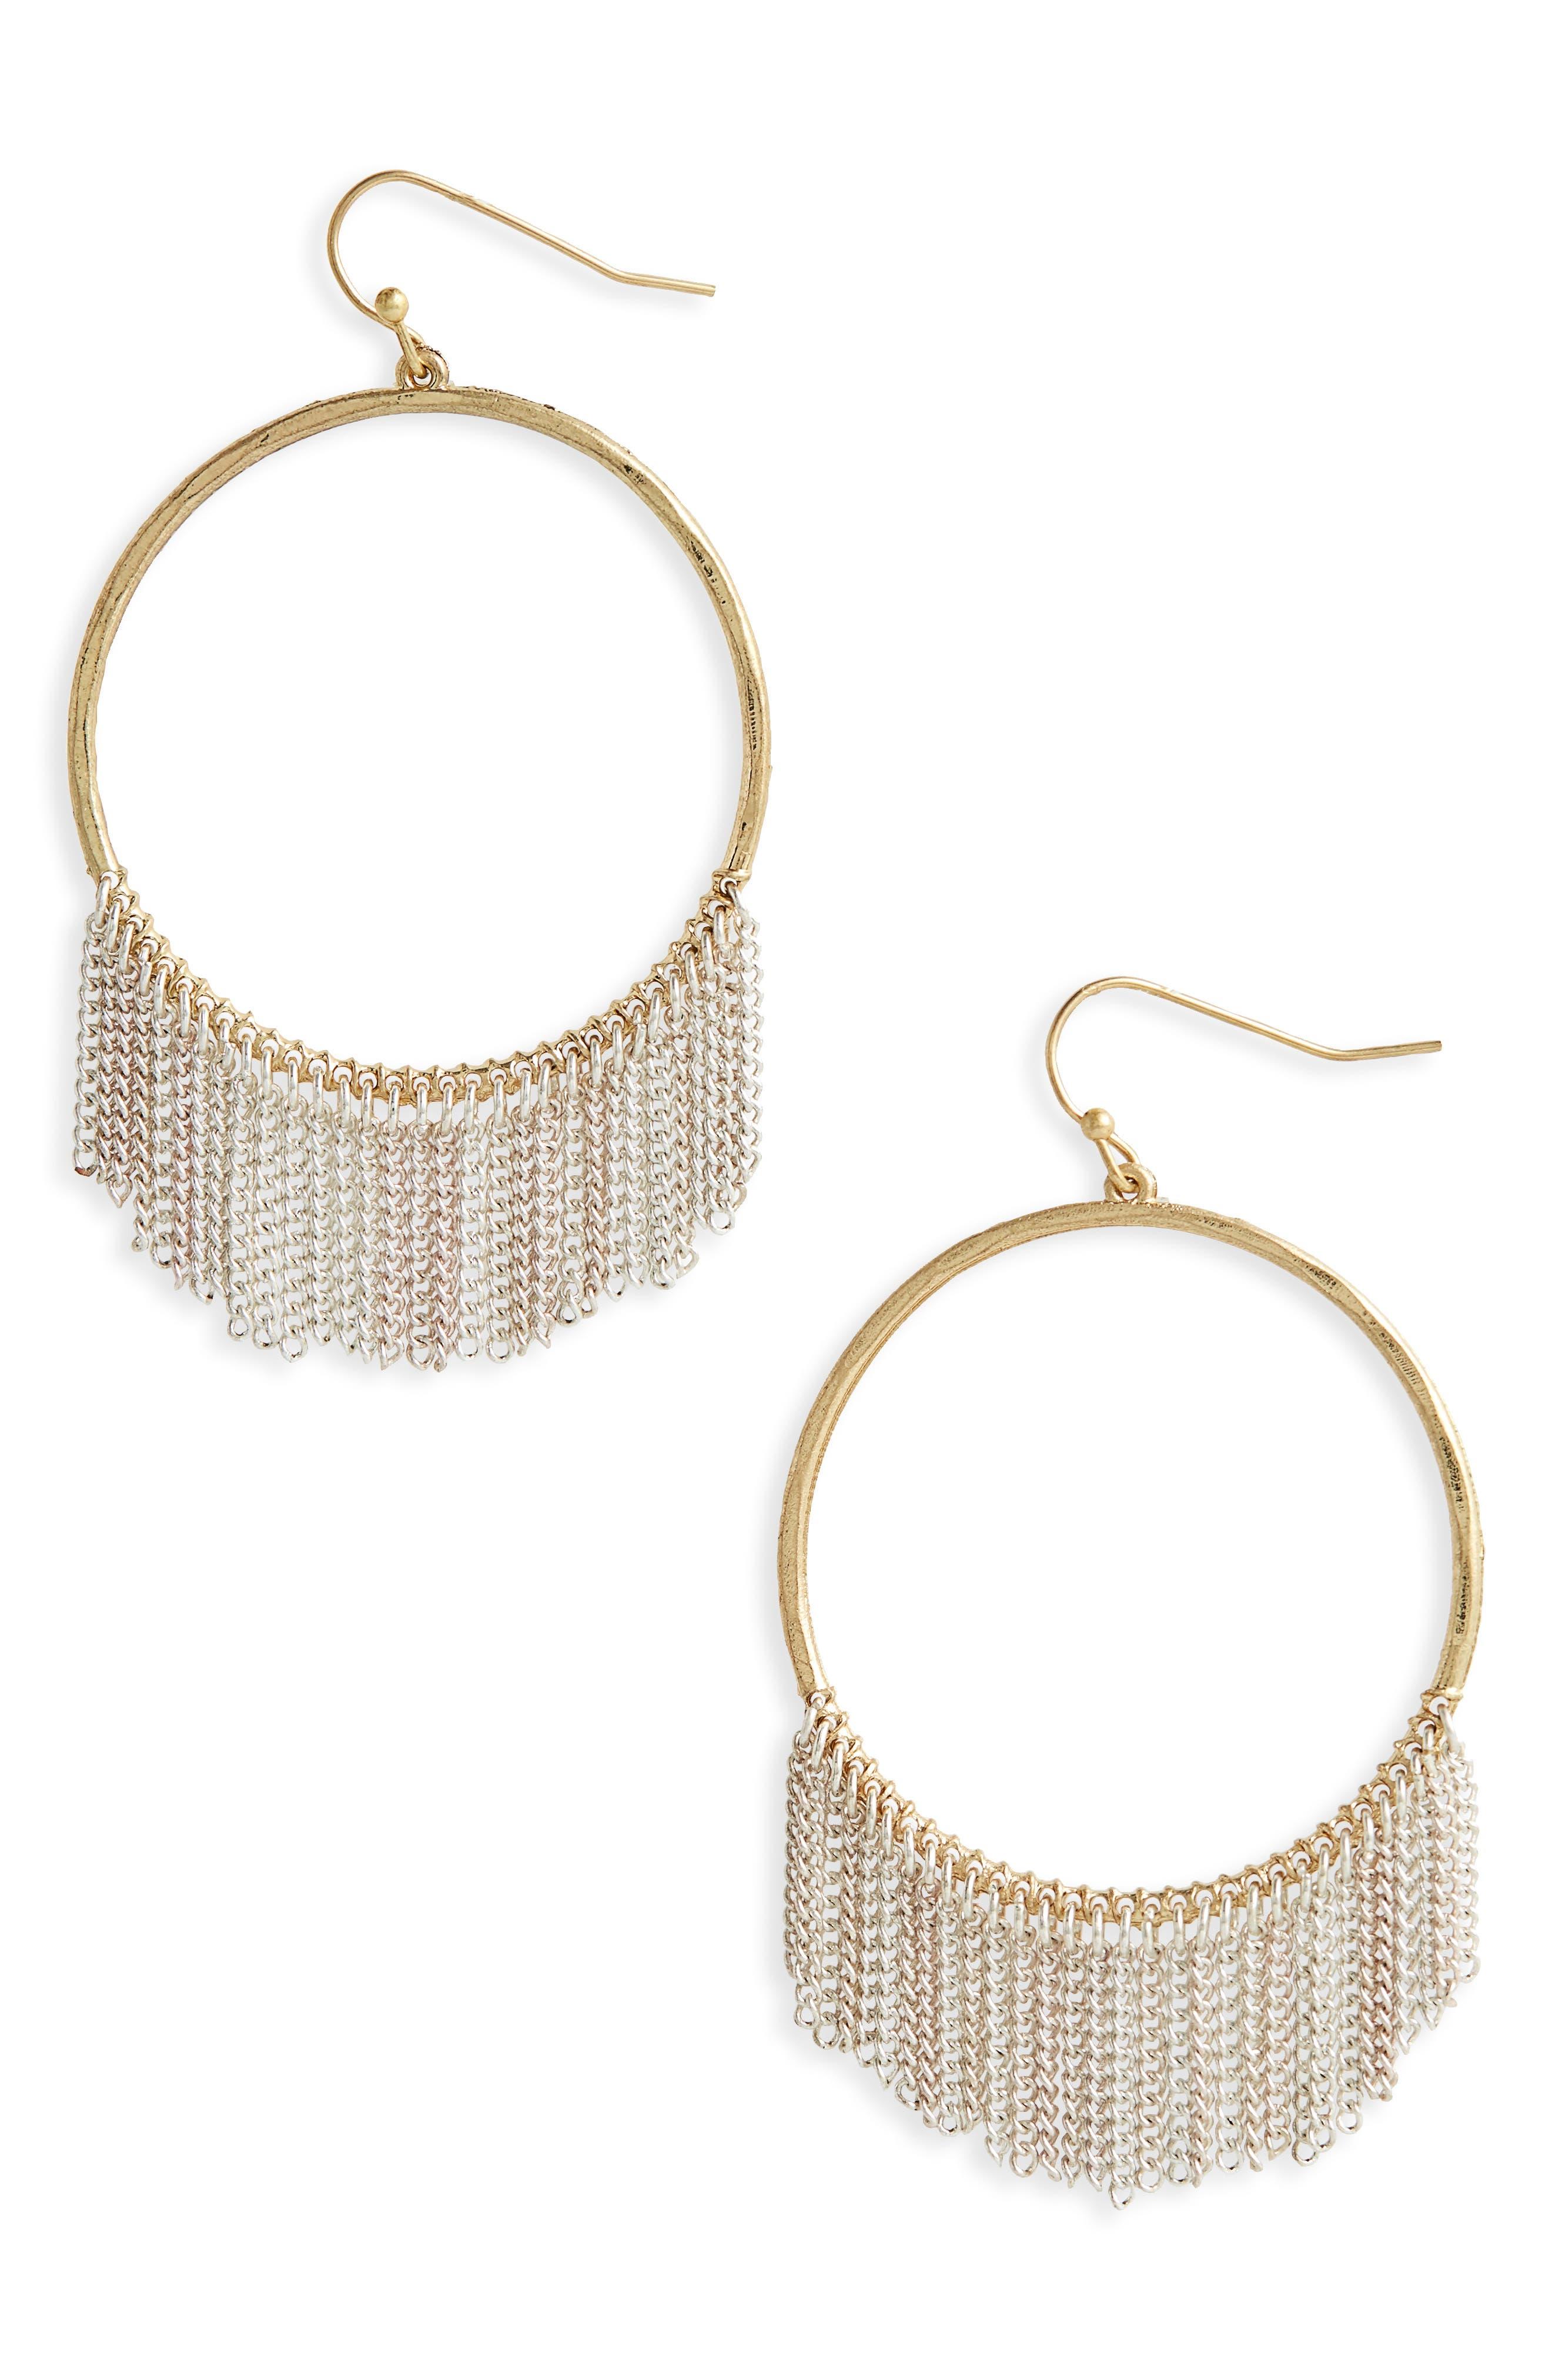 Main Image - Canvas Jewelry Tassel Hoop Earrings